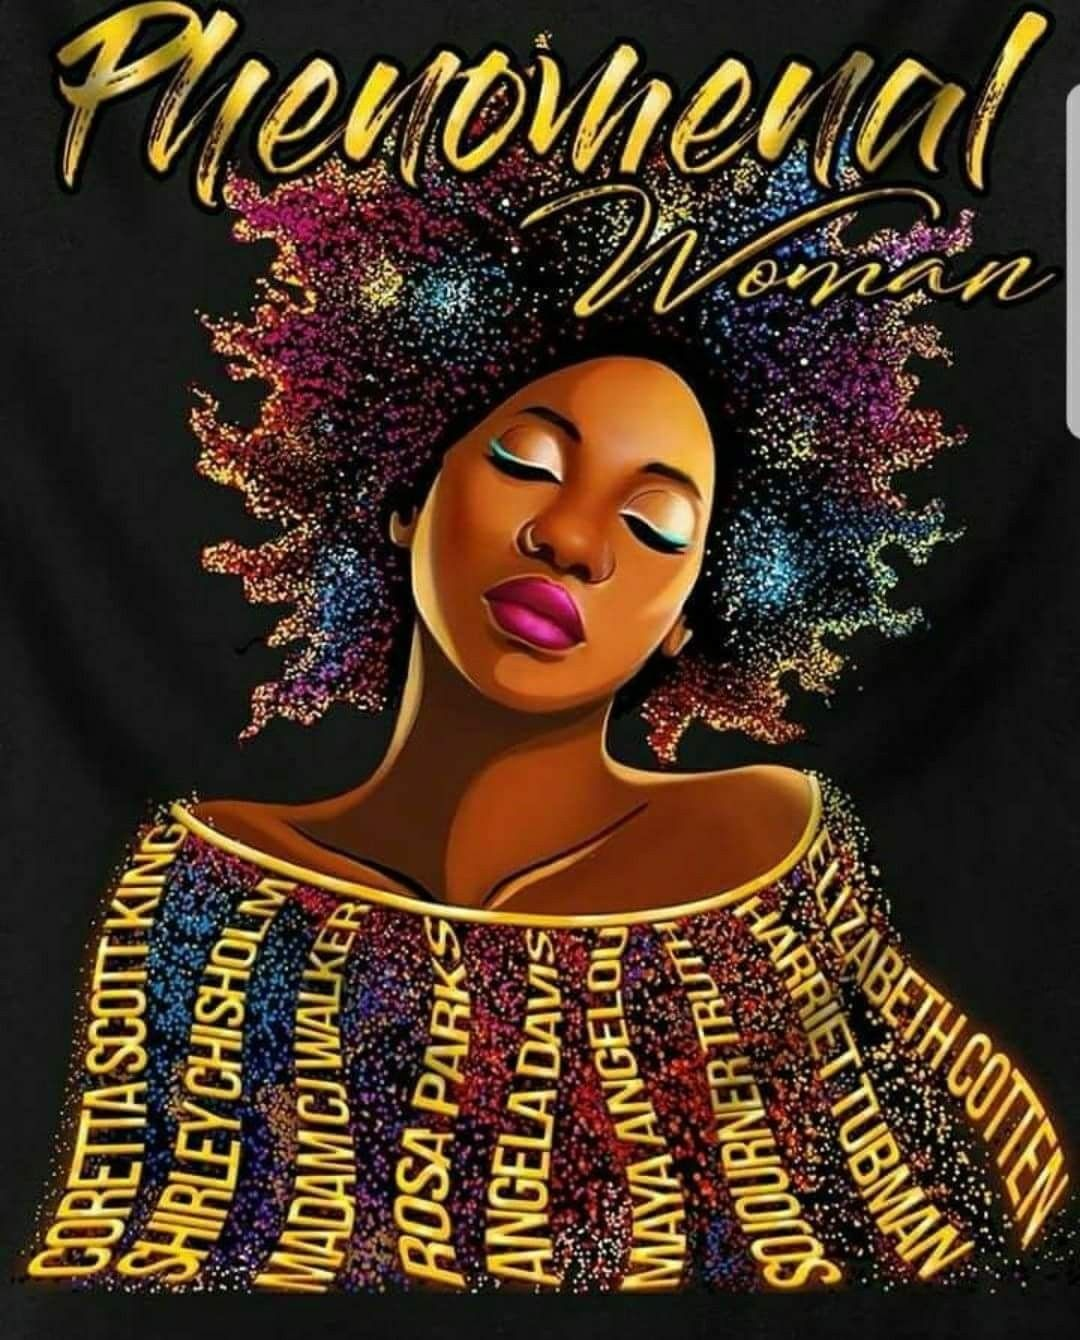 Phenomenal Woman Black Girl Art Black Love Art Black Women Art